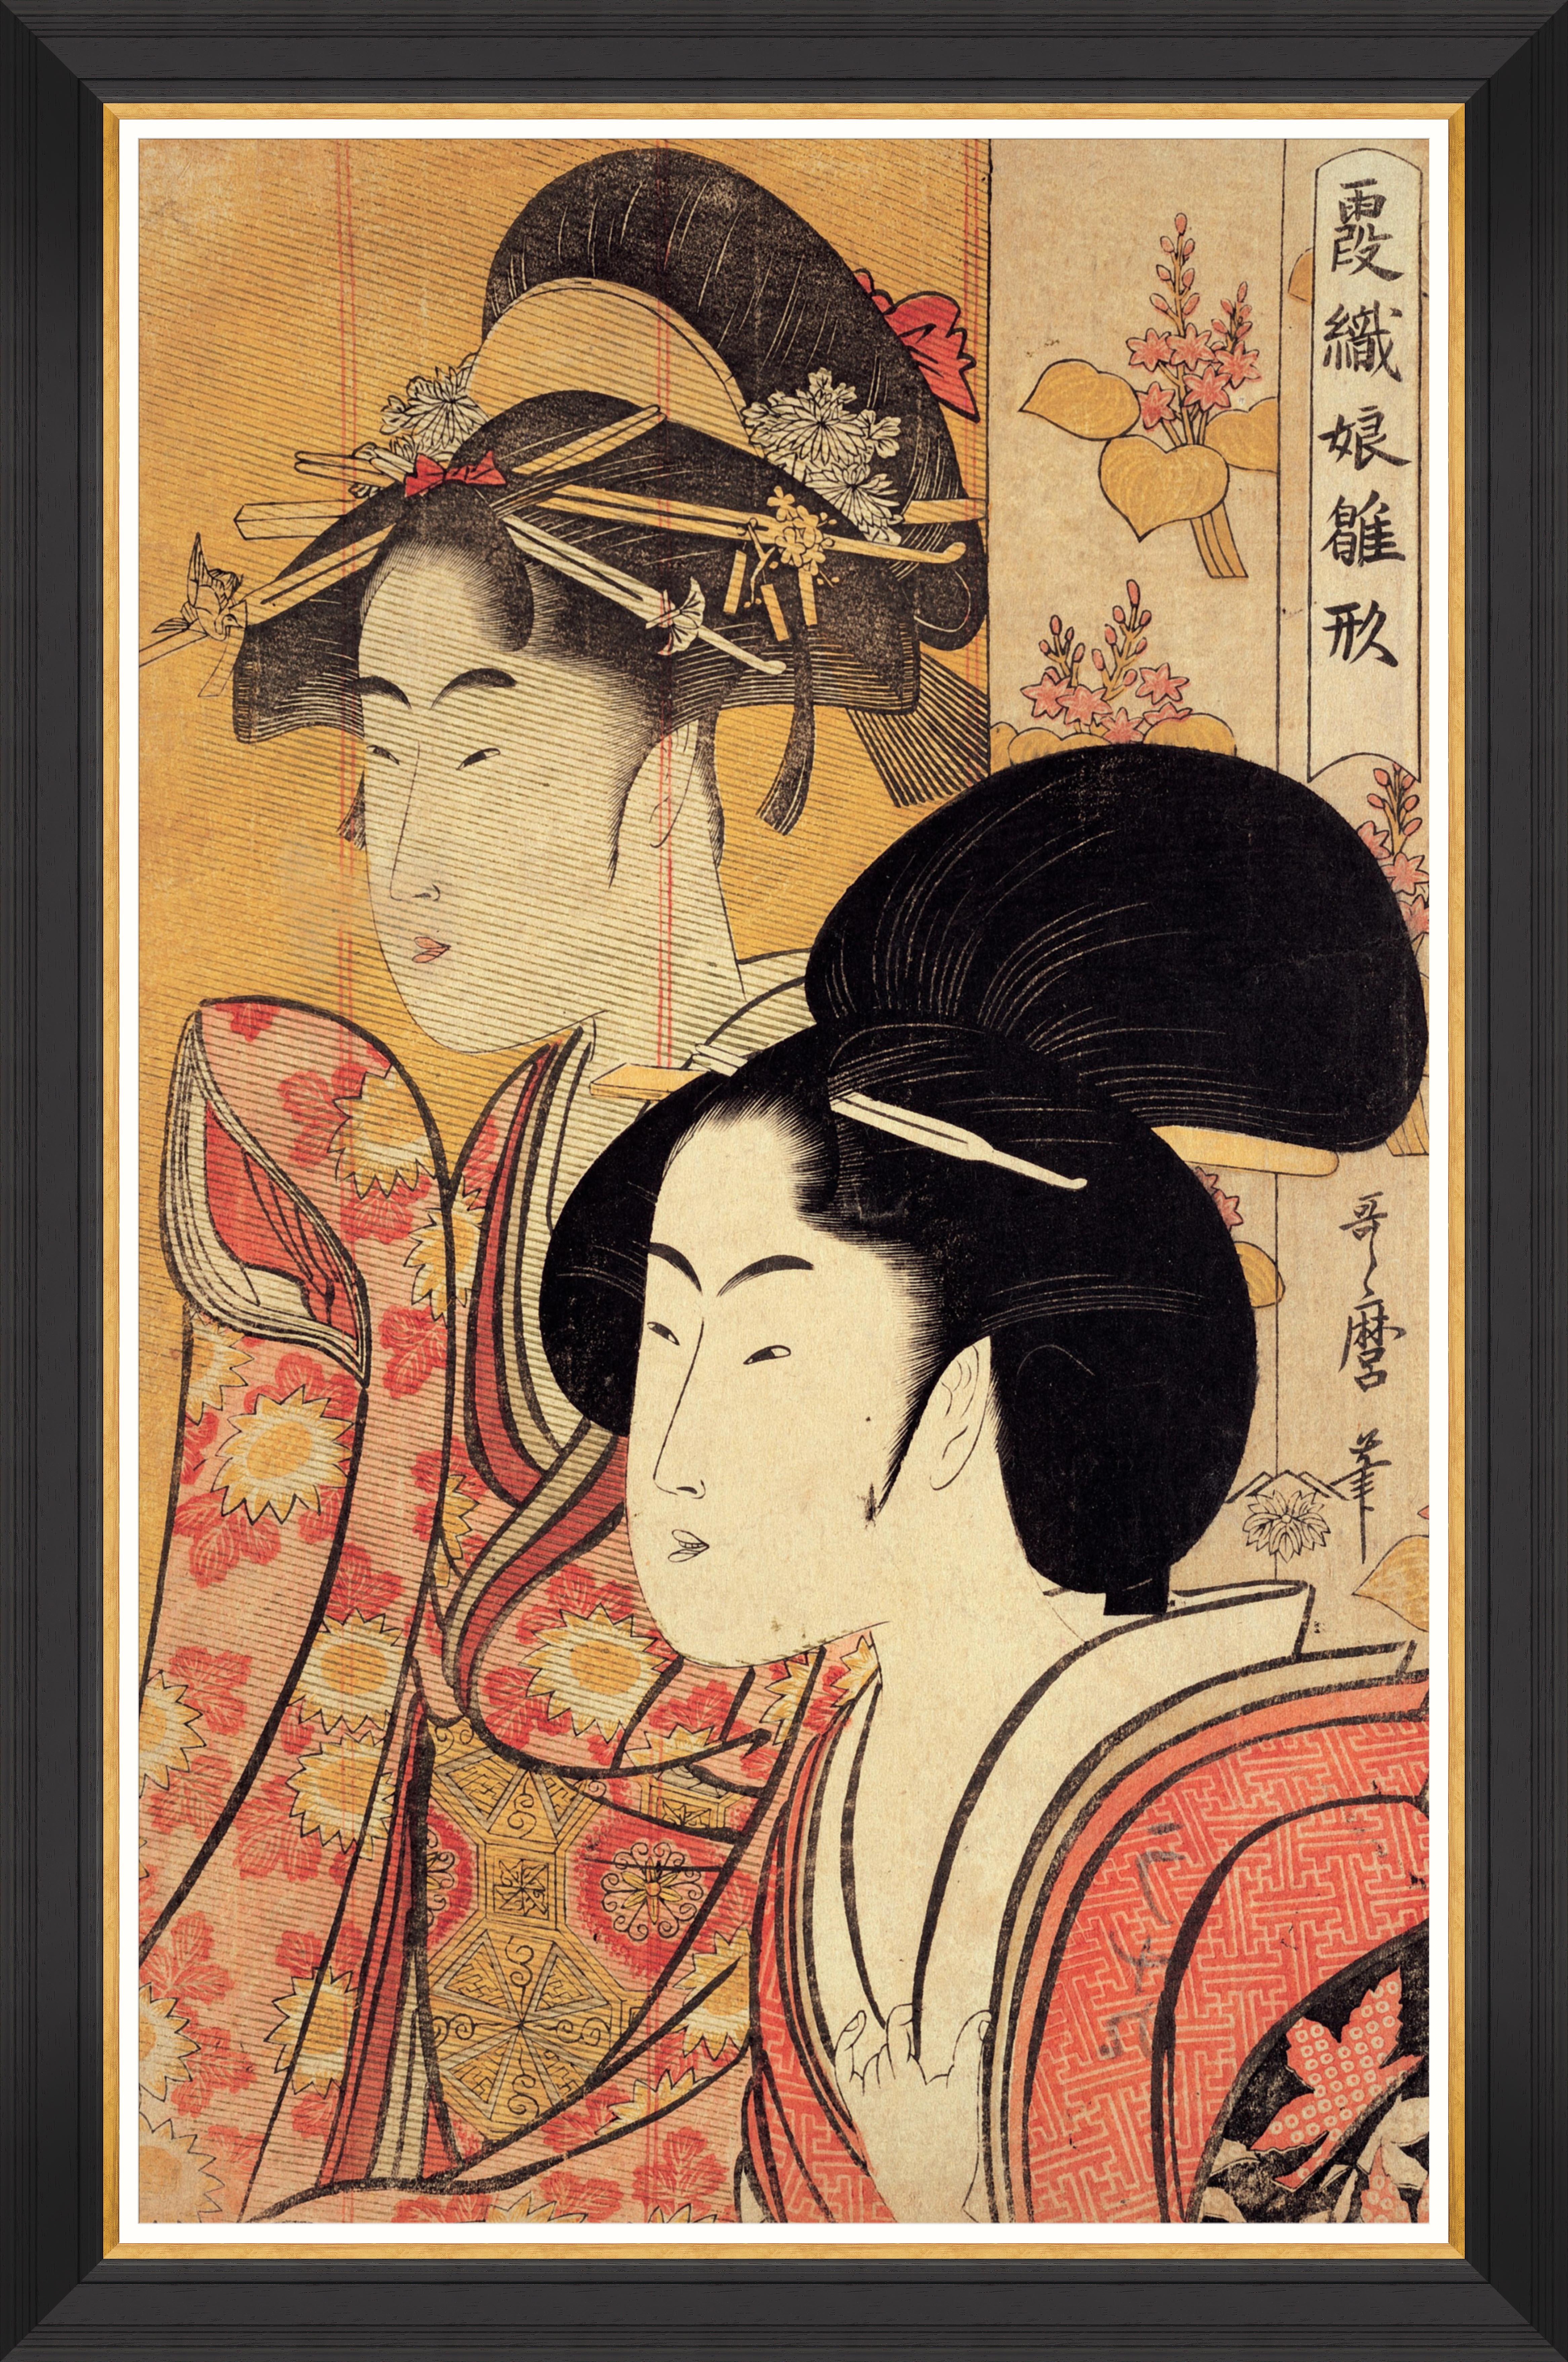 TWO BEAUTIES BY KITAGAWA UTAMARO Framed Print